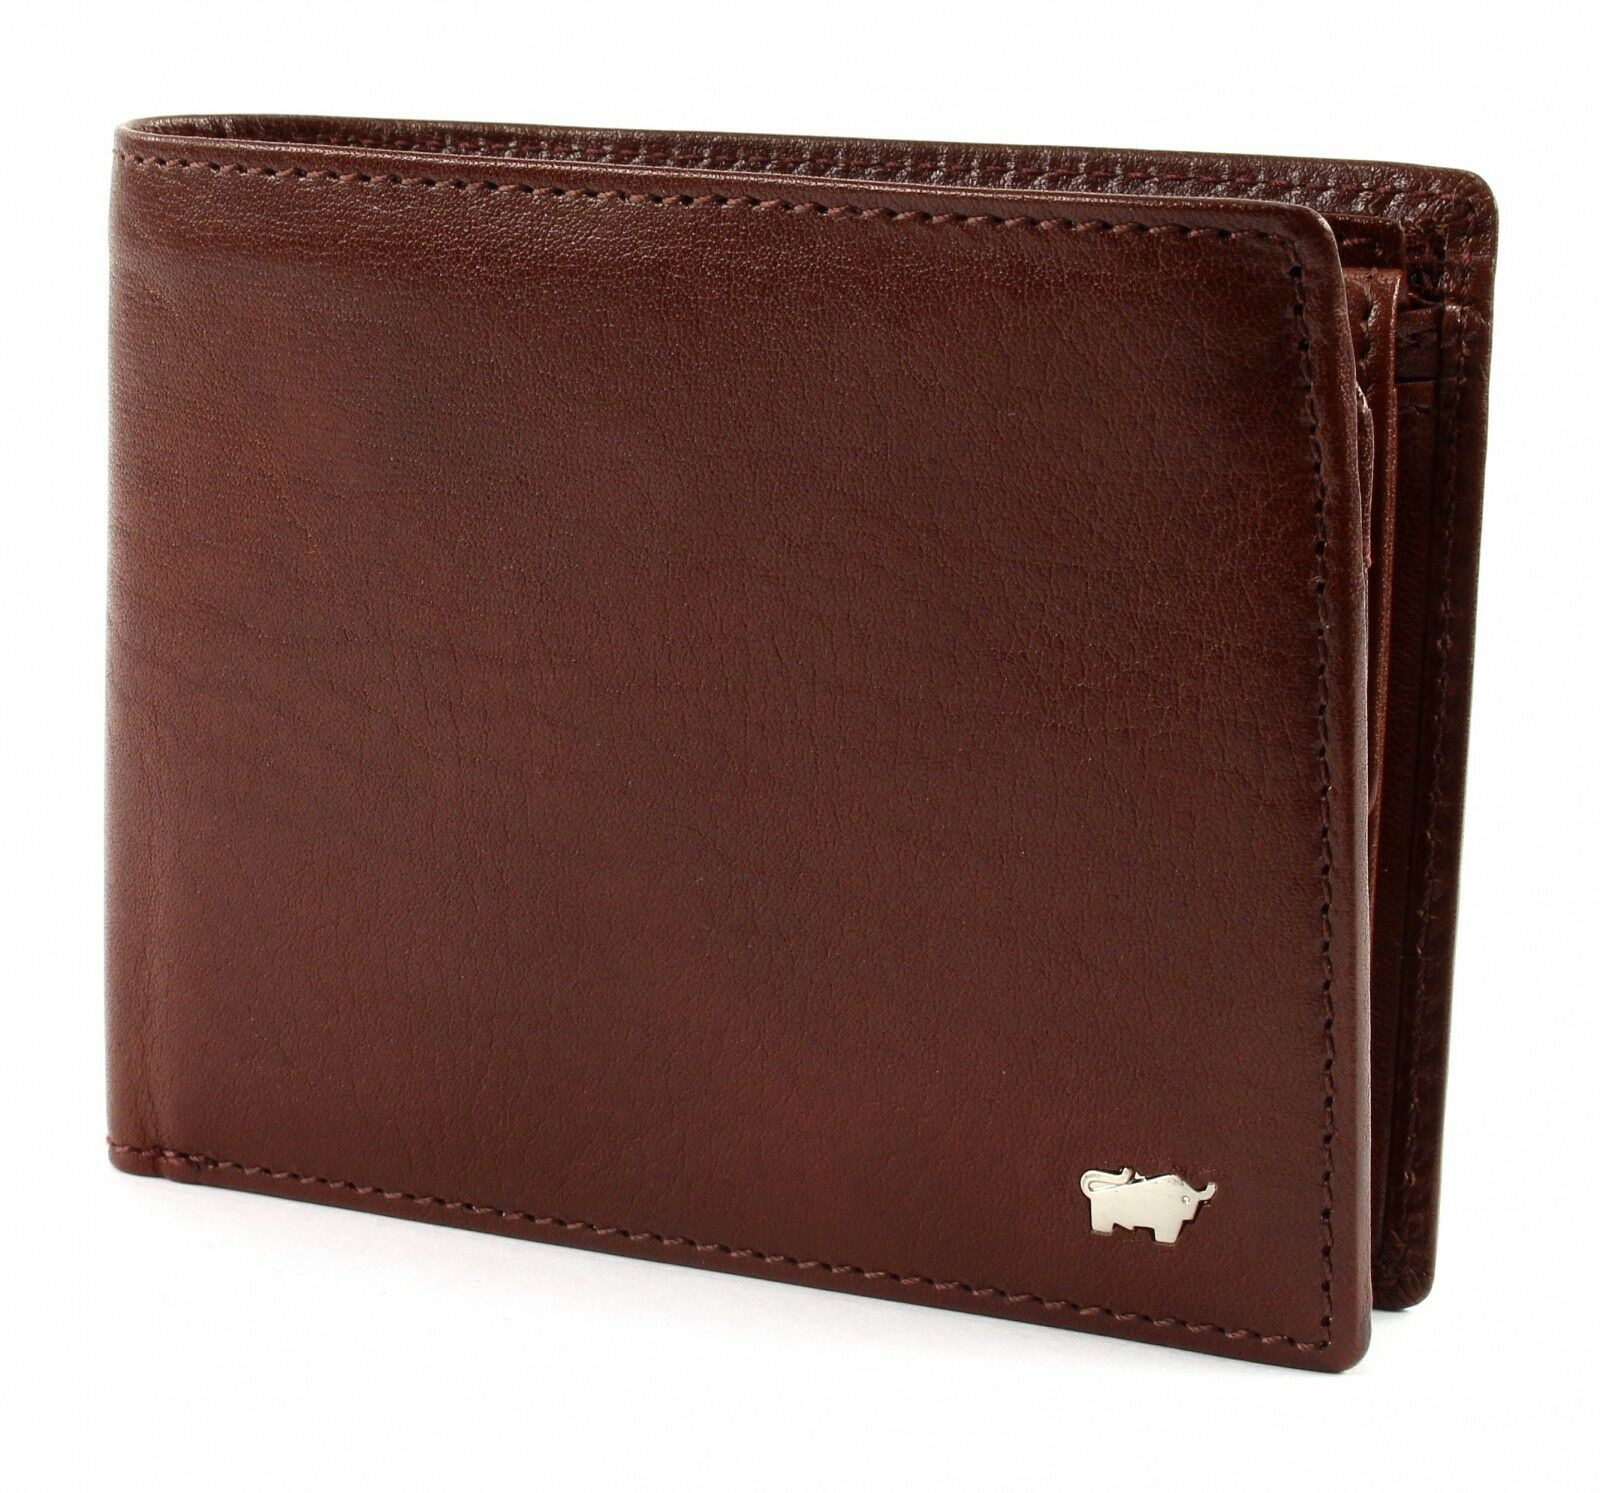 Braun Büffel Country Secure Wallet with Flap High Geldbörse Palisandro Palisandro Palisandro Braun Neu | Moderner Modus  80fb73